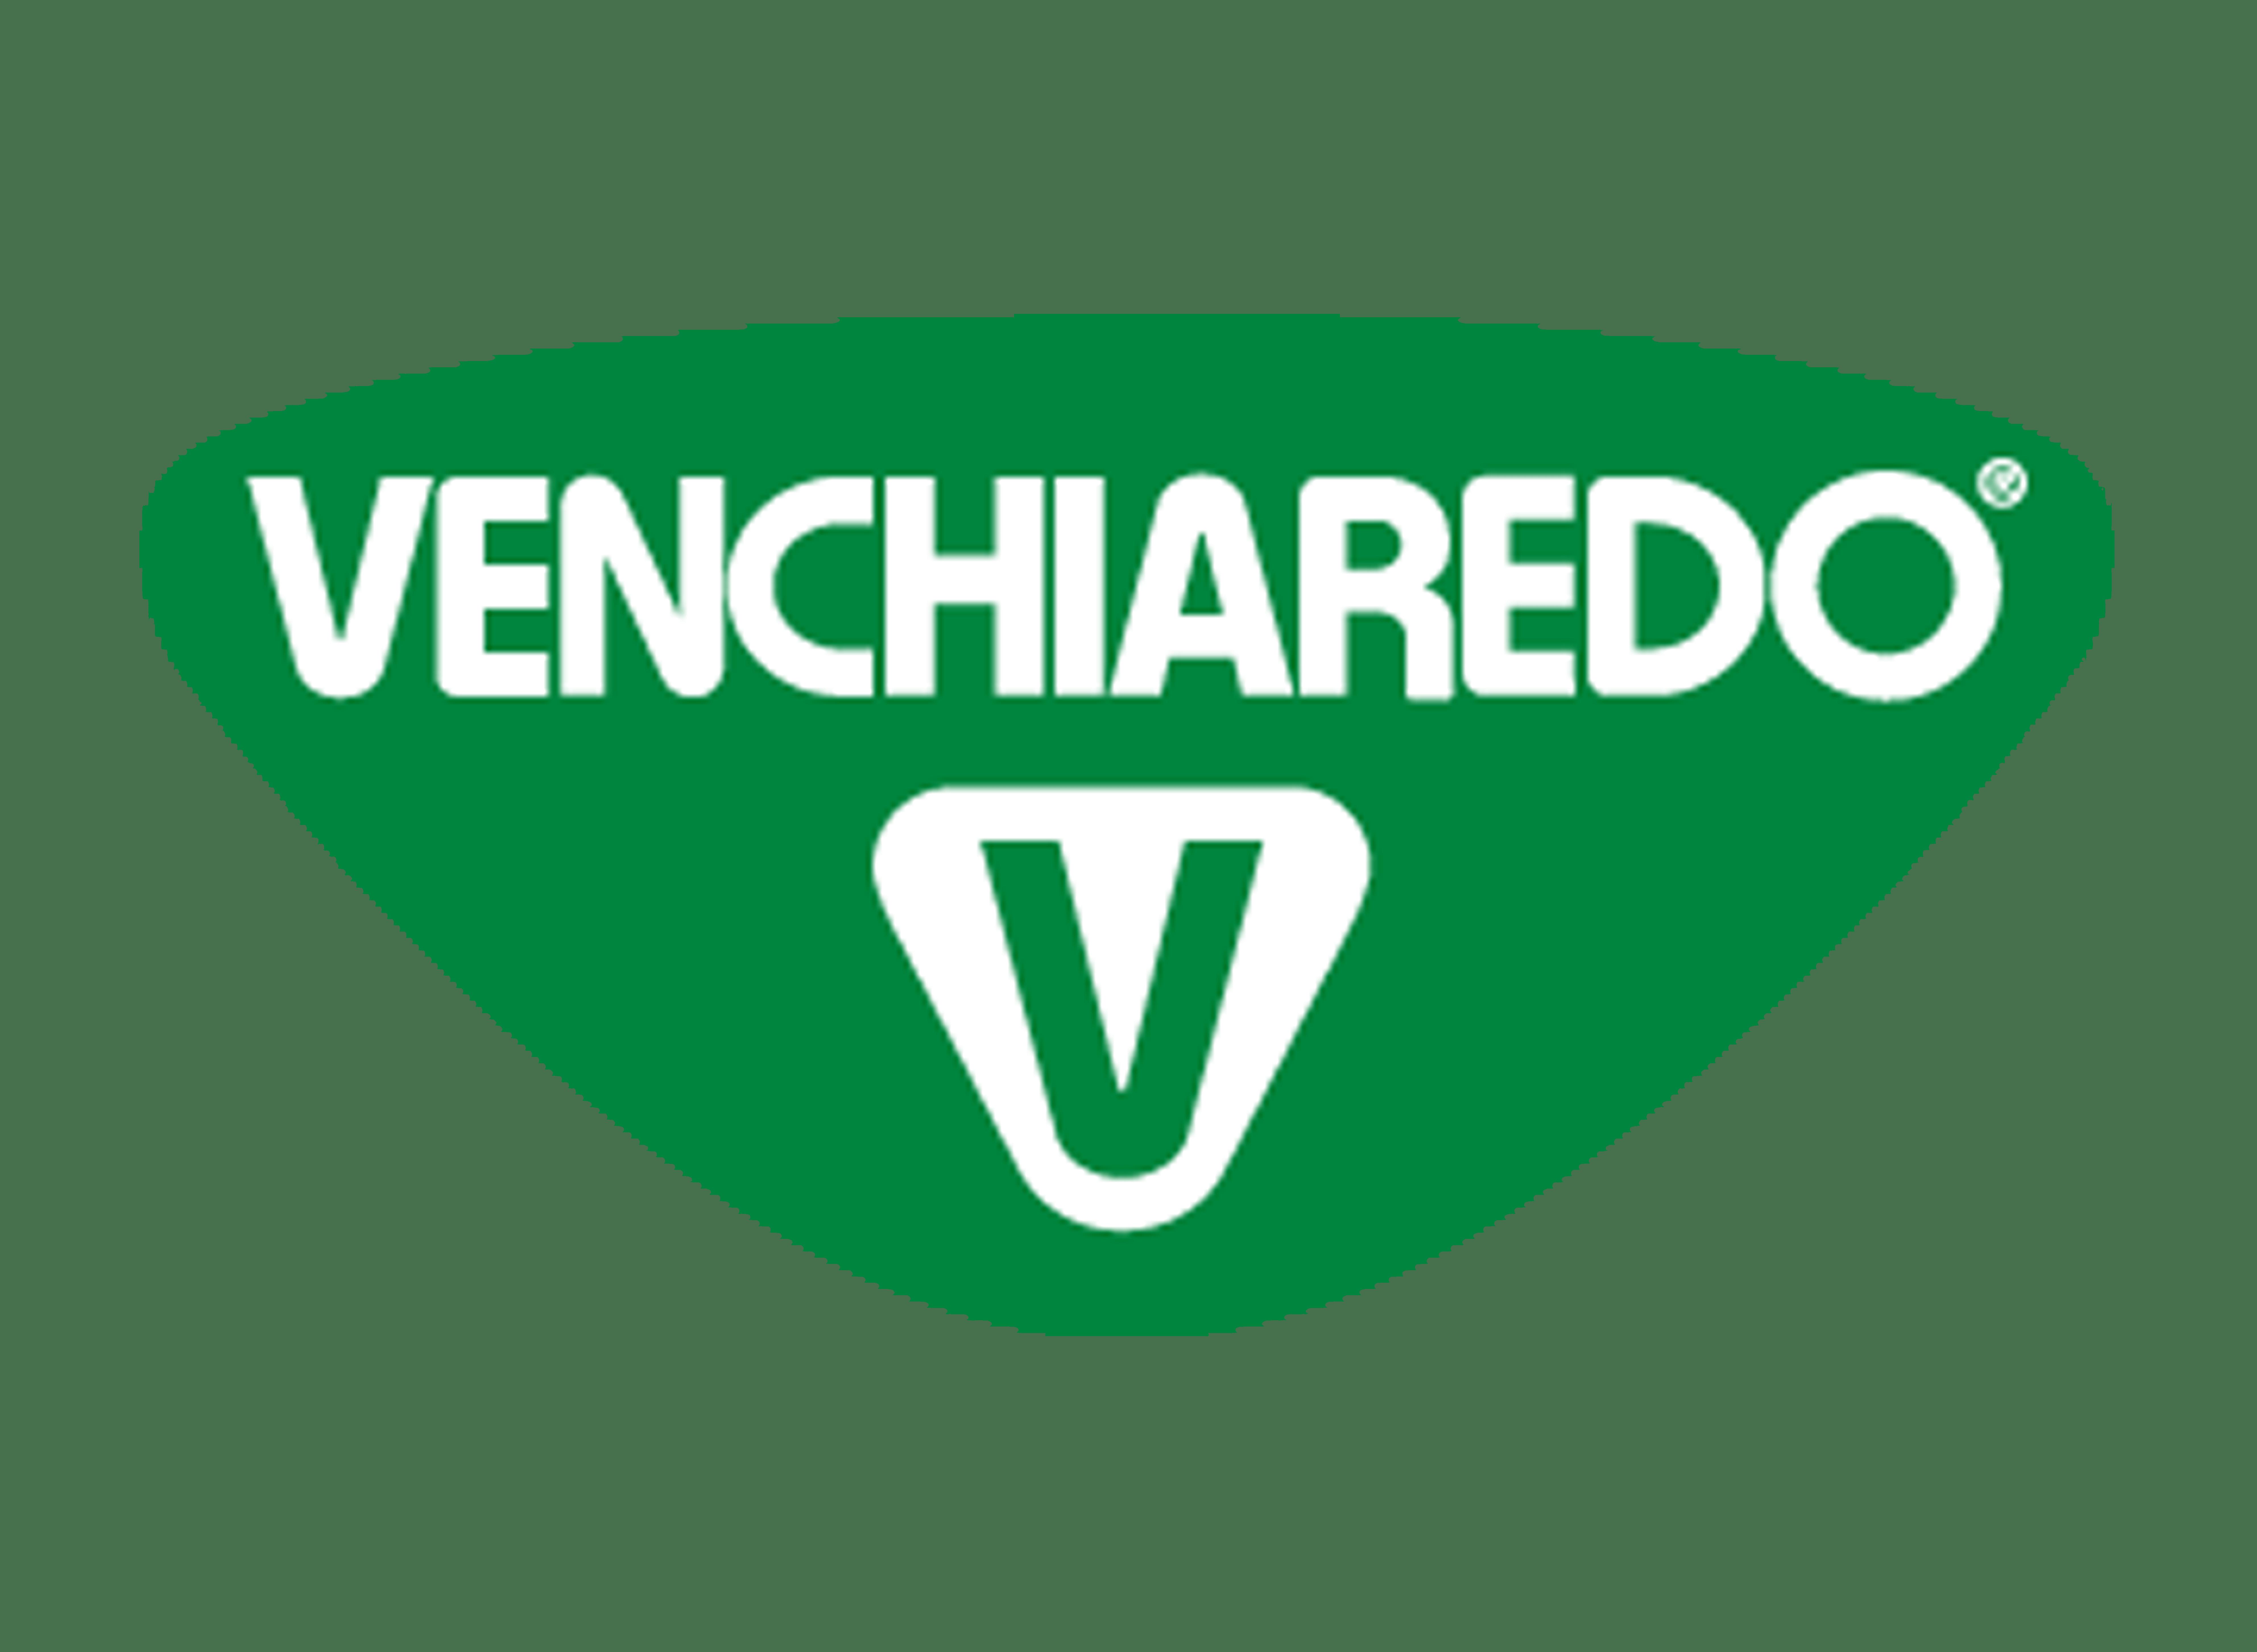 Venchiaredo company logo